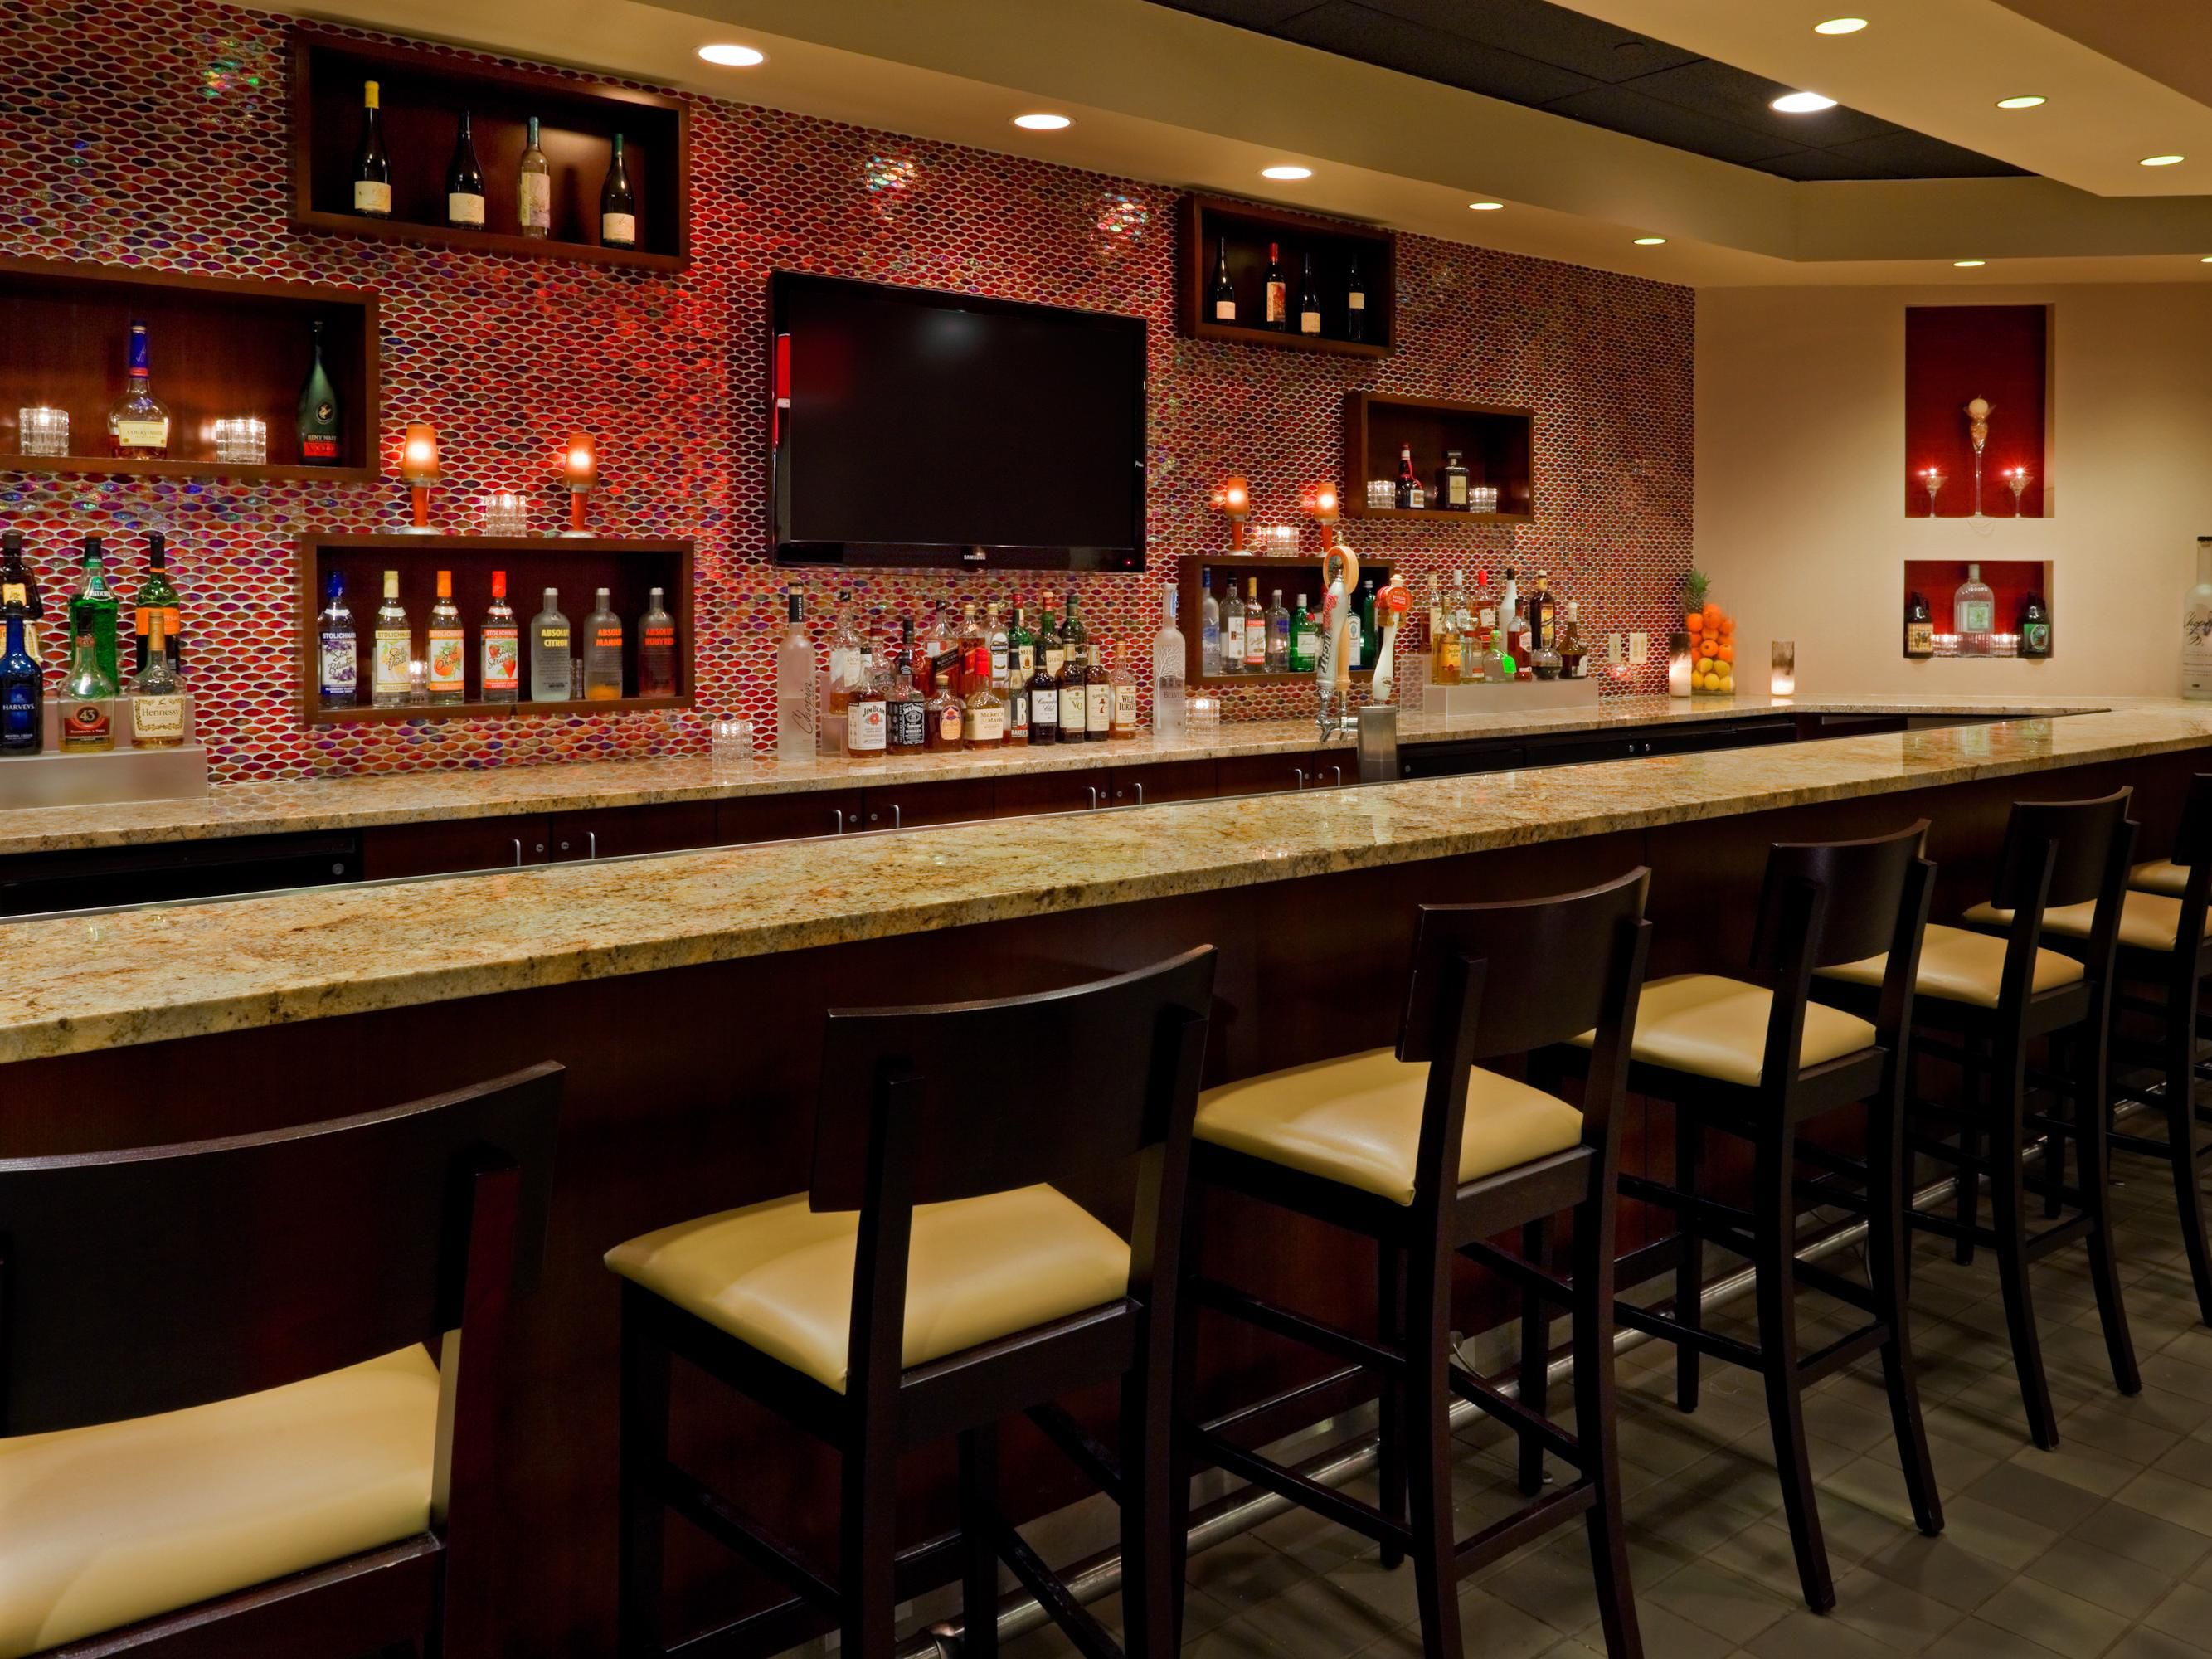 Restaurant Bar And Lounge Photo